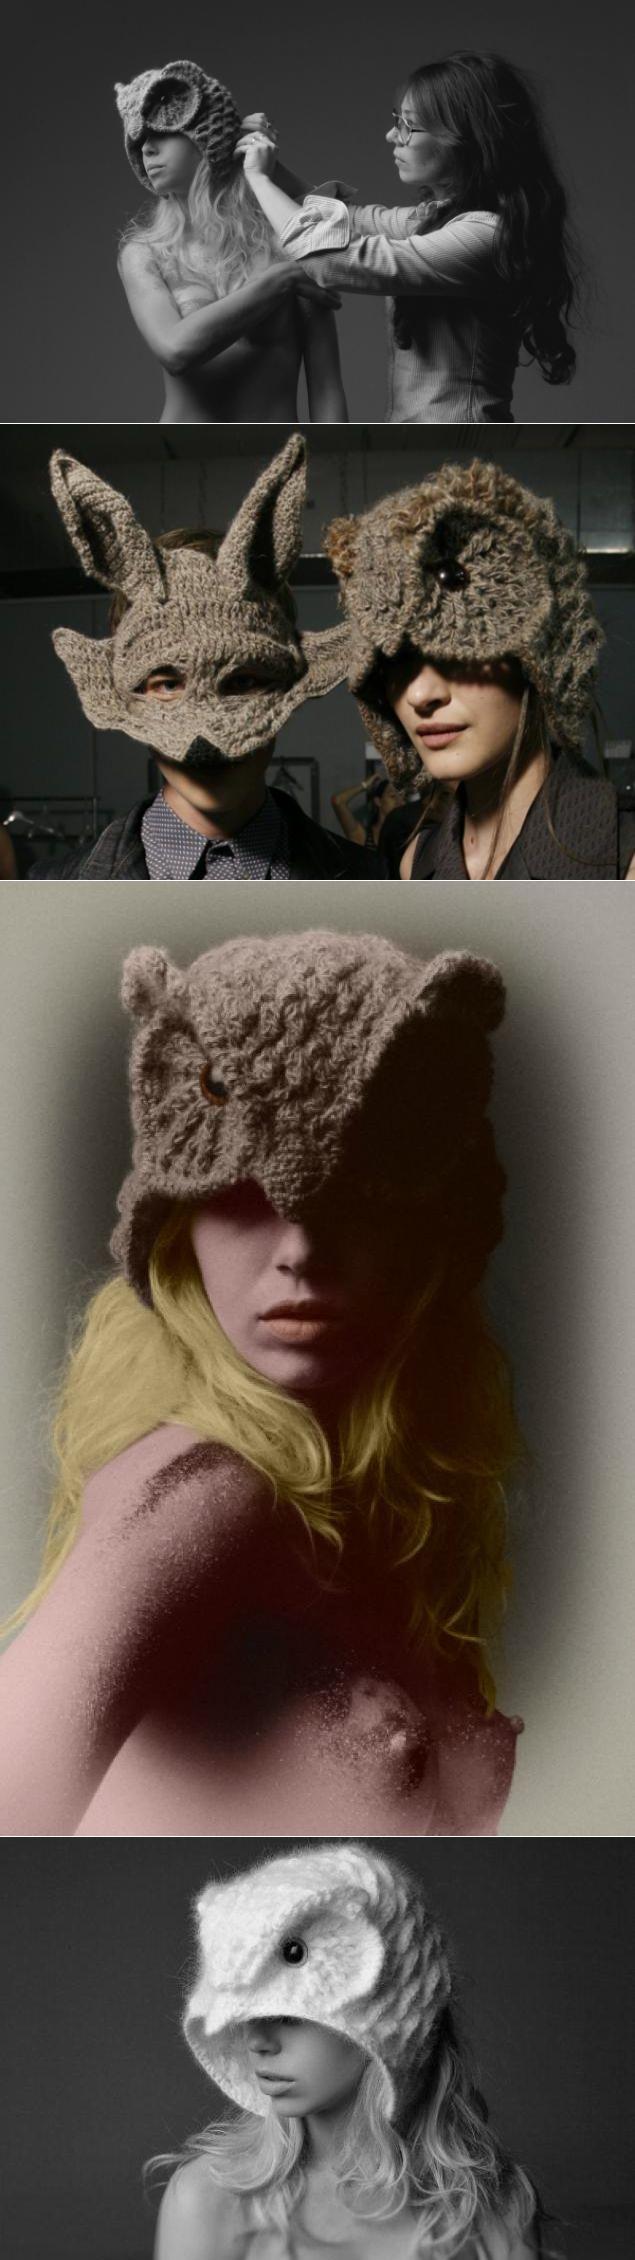 Cap-coruja roupas de malha de designer de Helen RDEL - Masters Fair - handmade, handmade